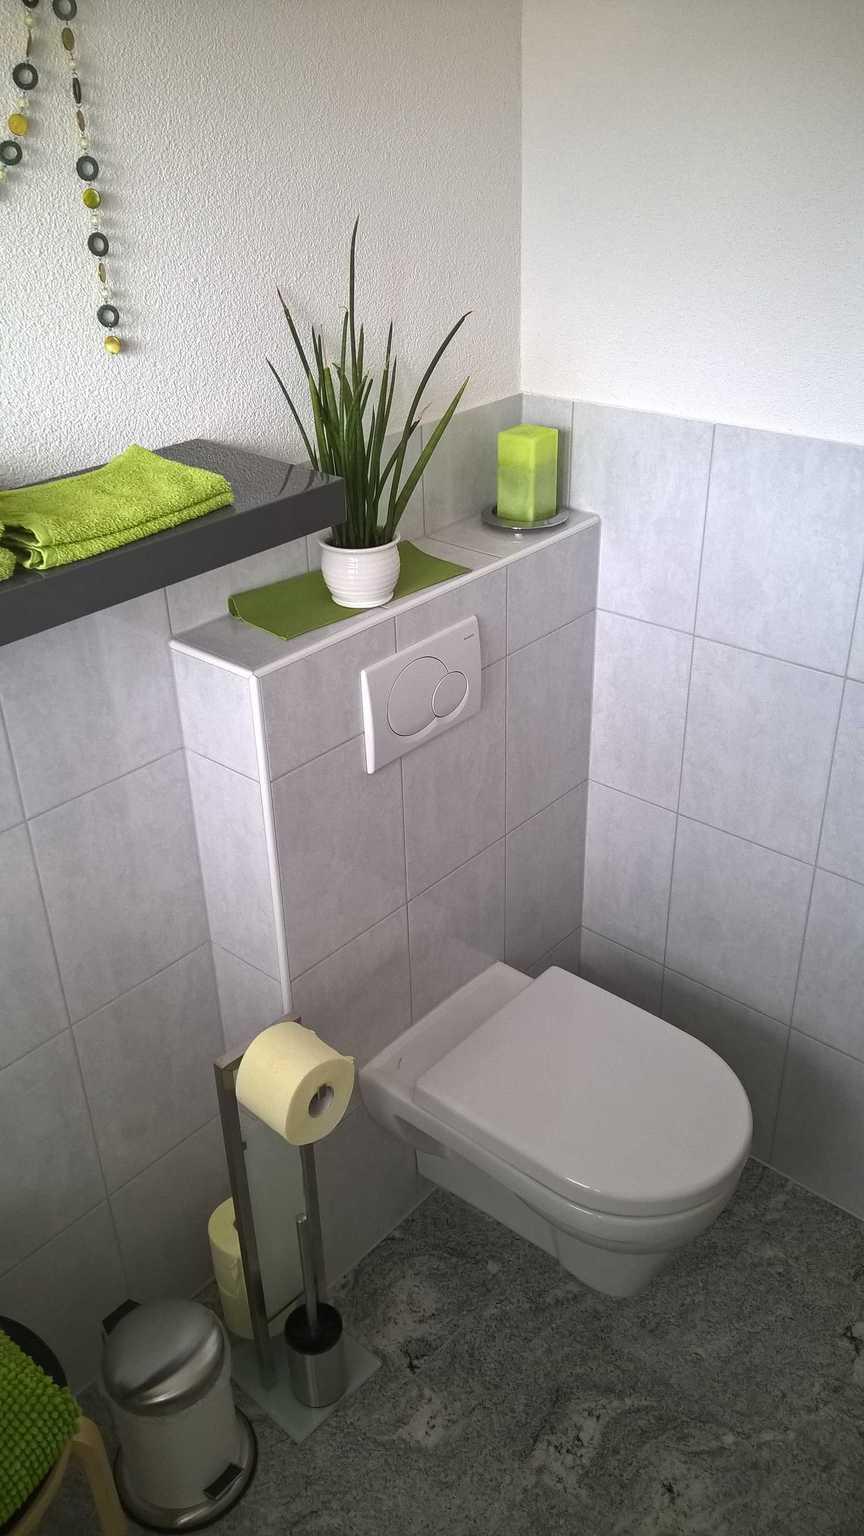 haus lena appartment f r 2 4 personen in tarrenz tirol objekt 95155. Black Bedroom Furniture Sets. Home Design Ideas